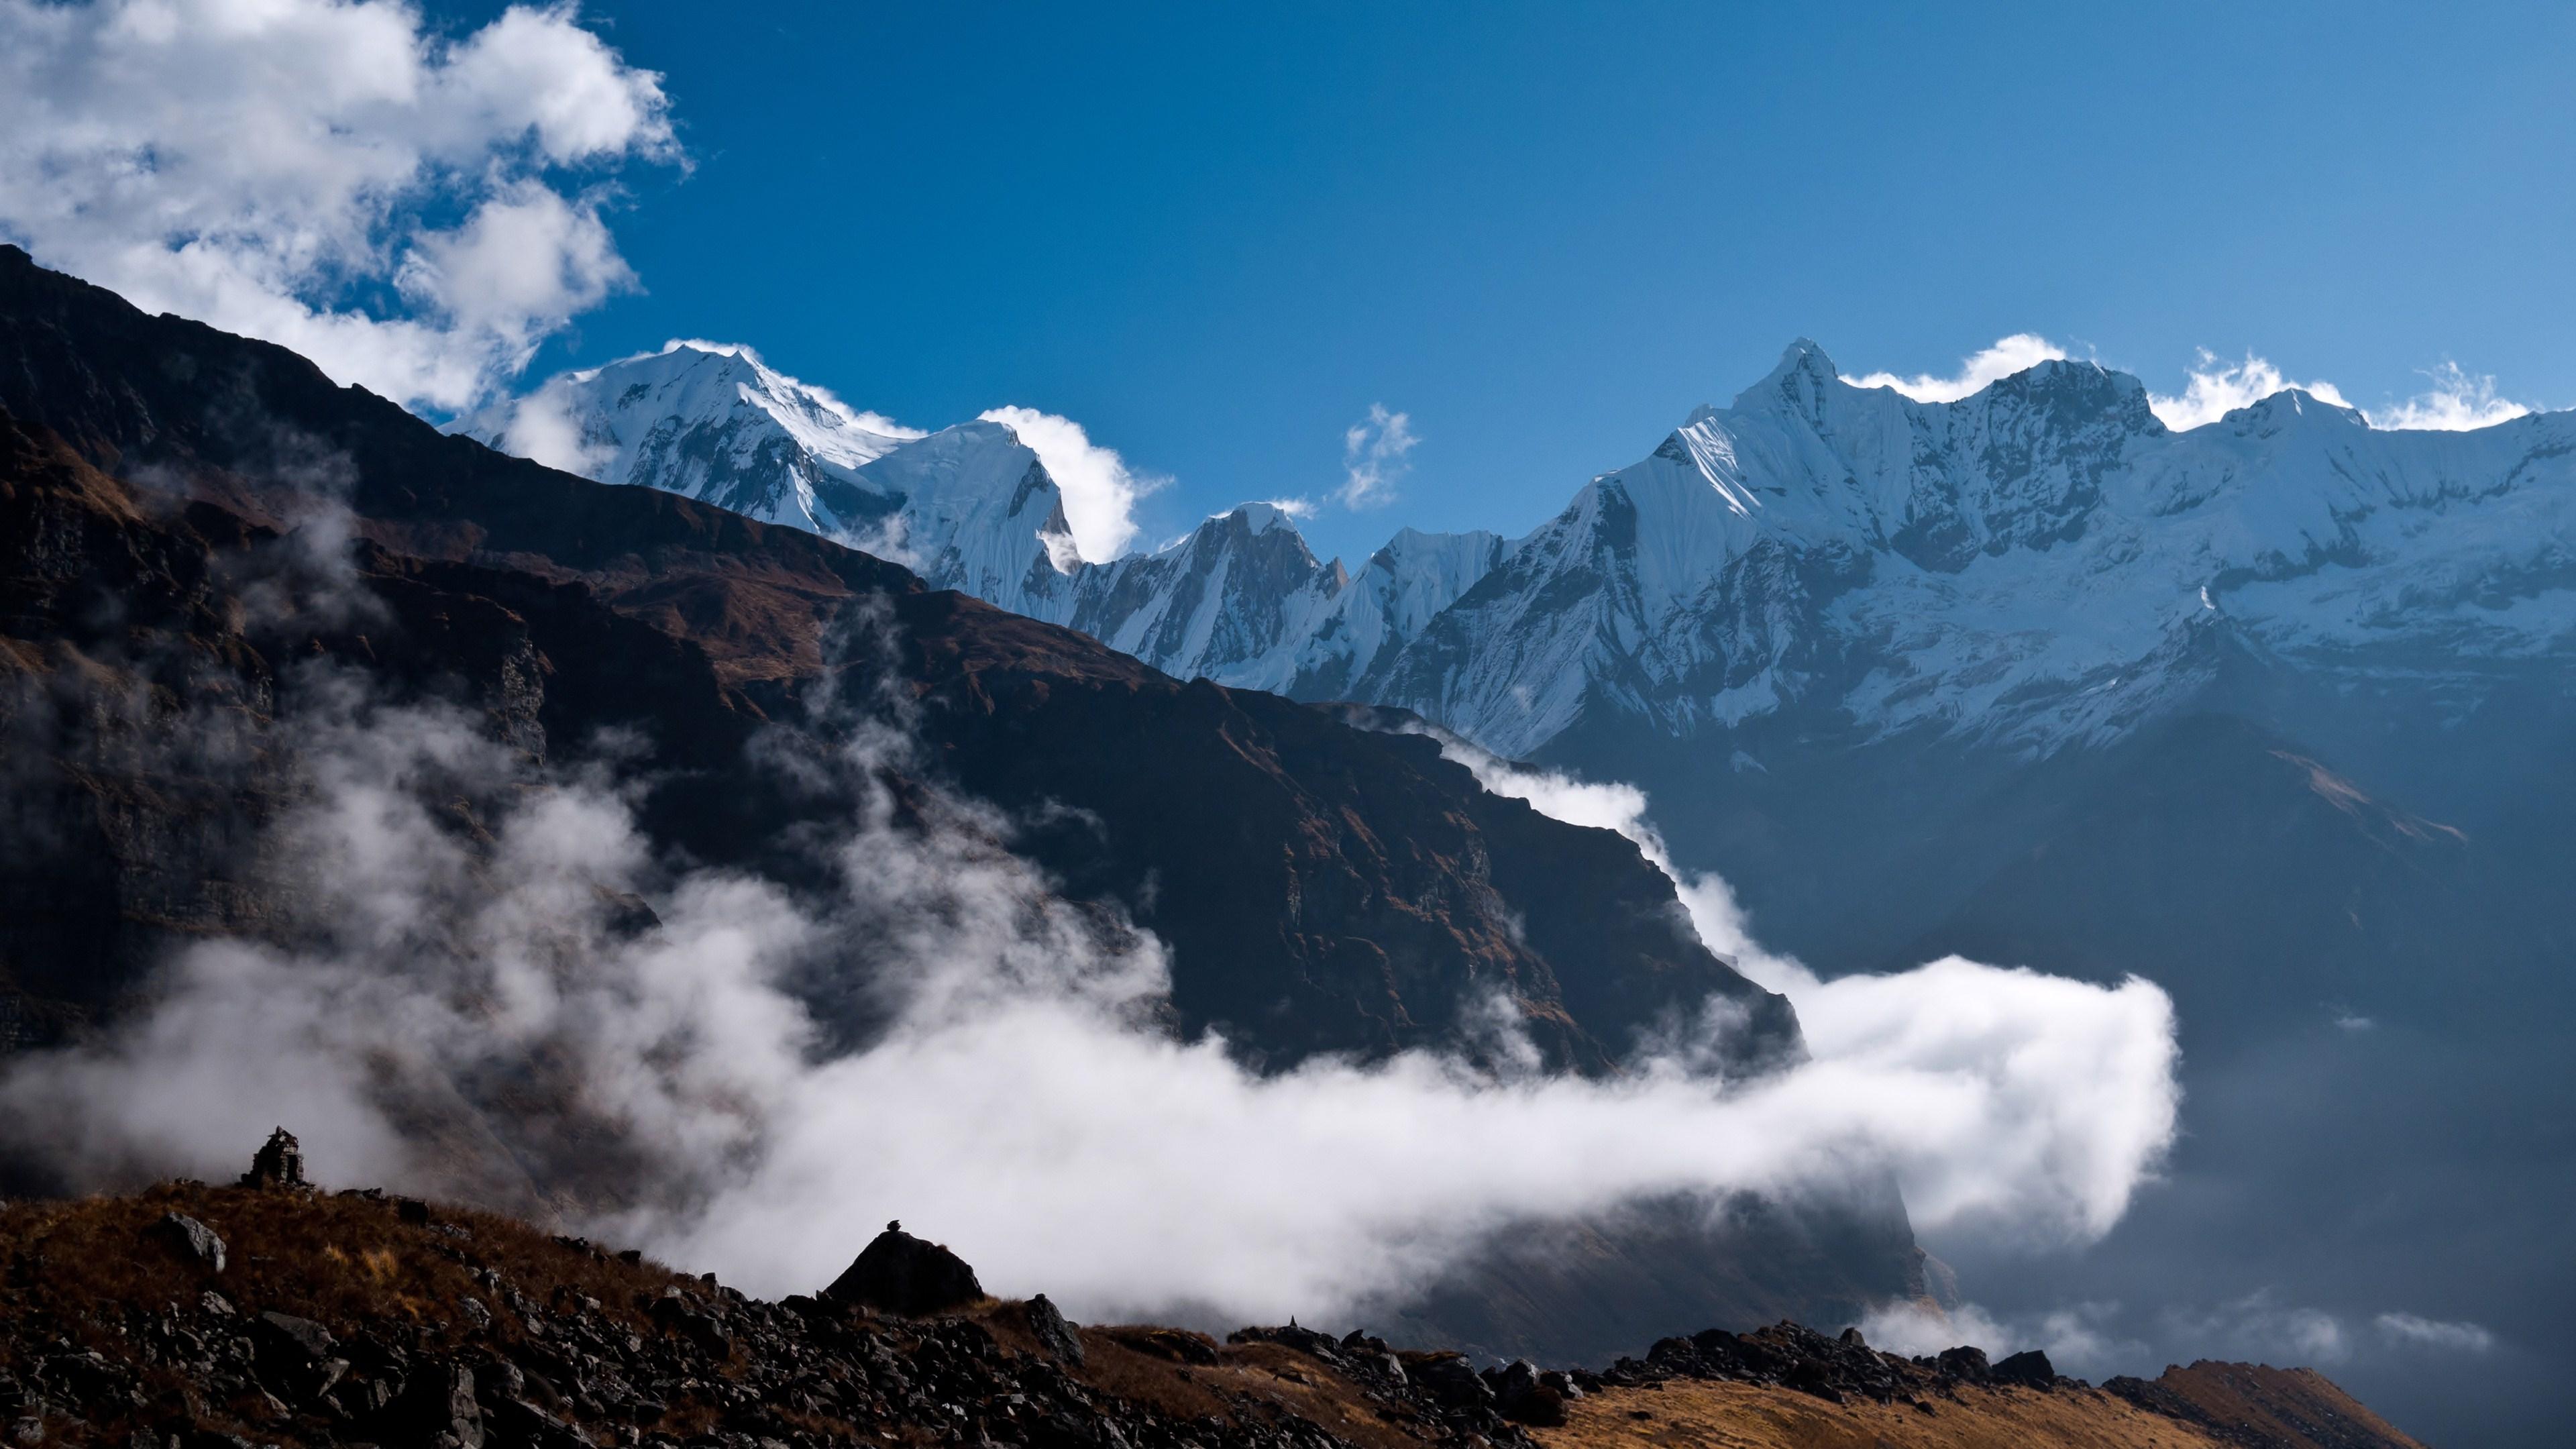 Mountain 4k ultra hd wallpaper background image - Himalaya pictures wallpaper ...